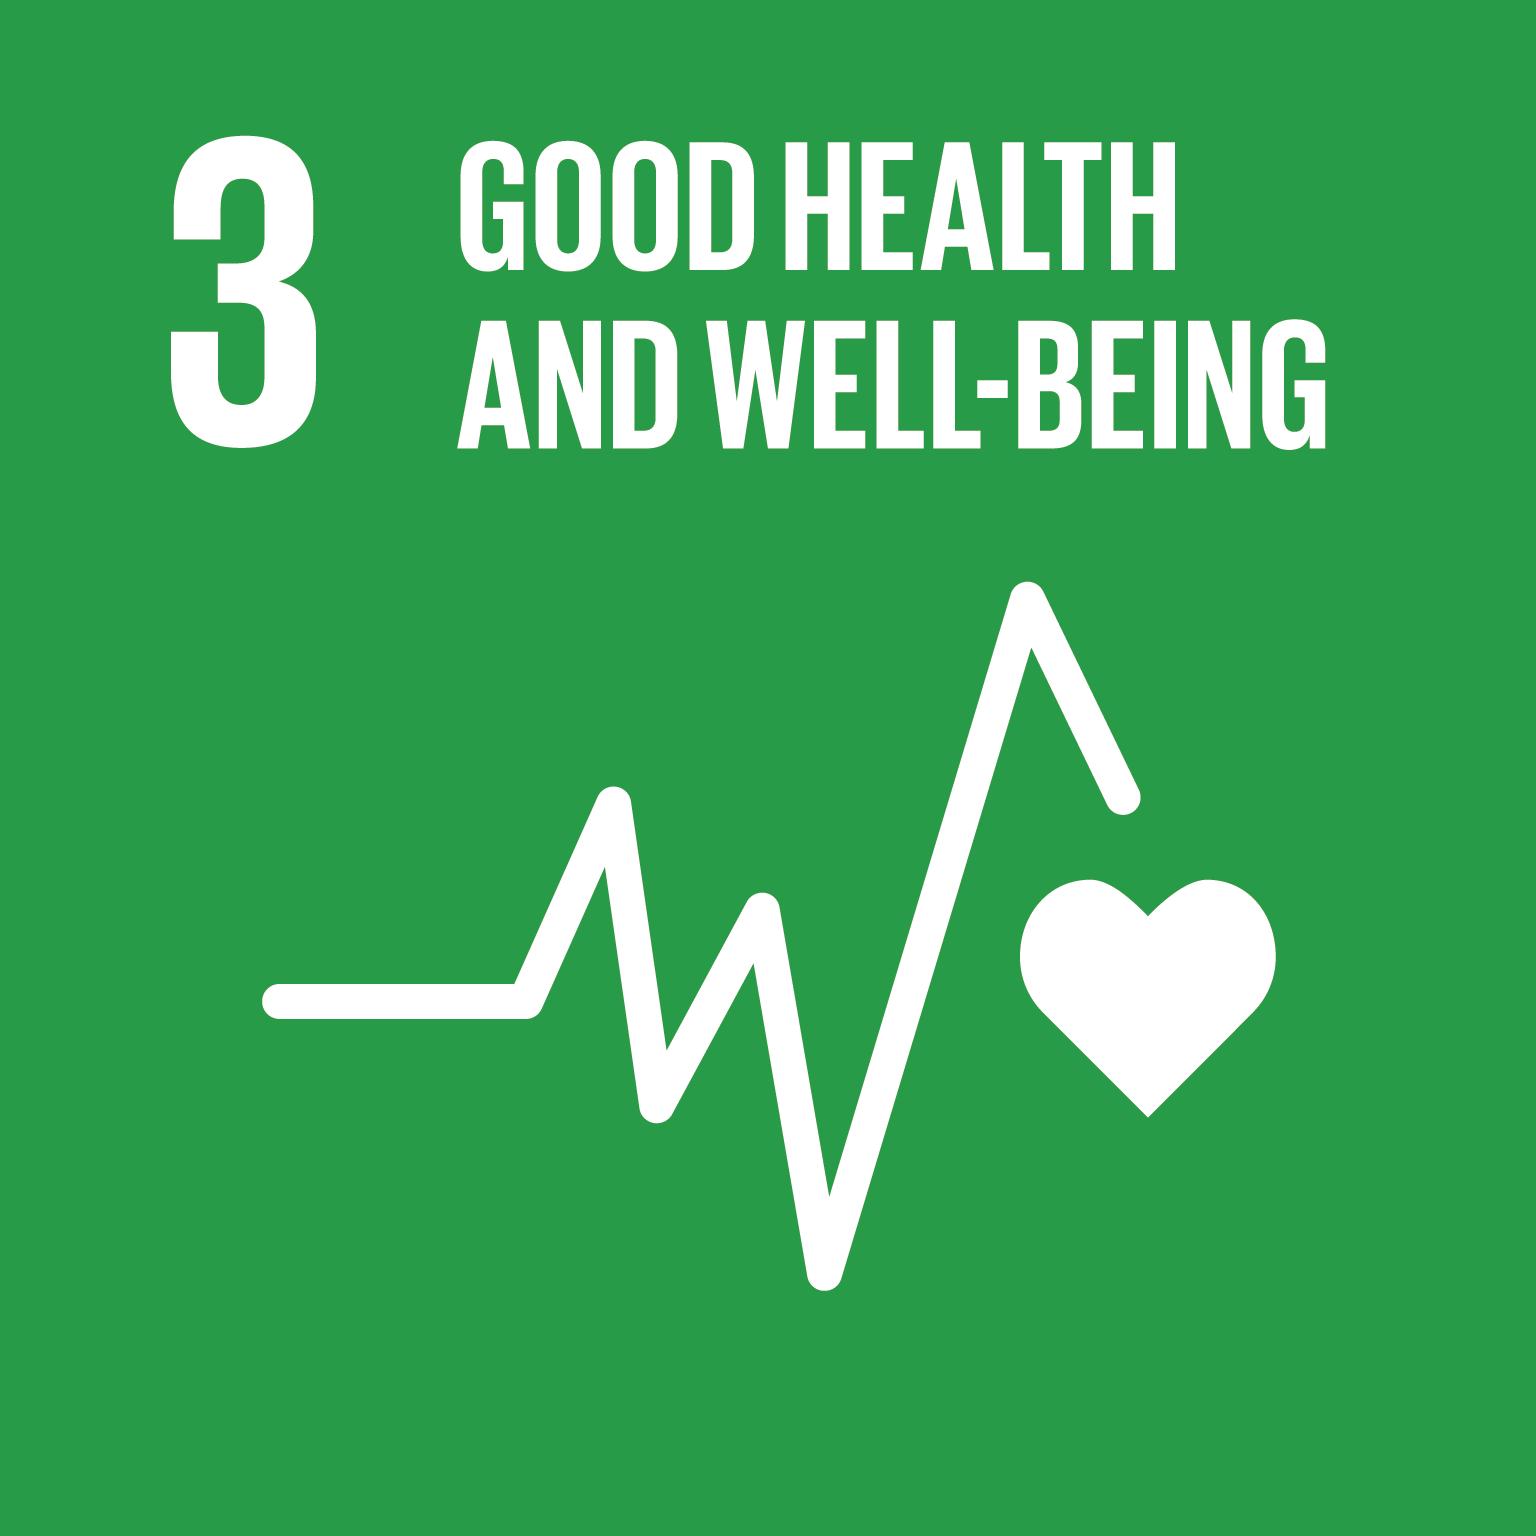 E_SDG goals_icons-individual-rgb-03-1.png